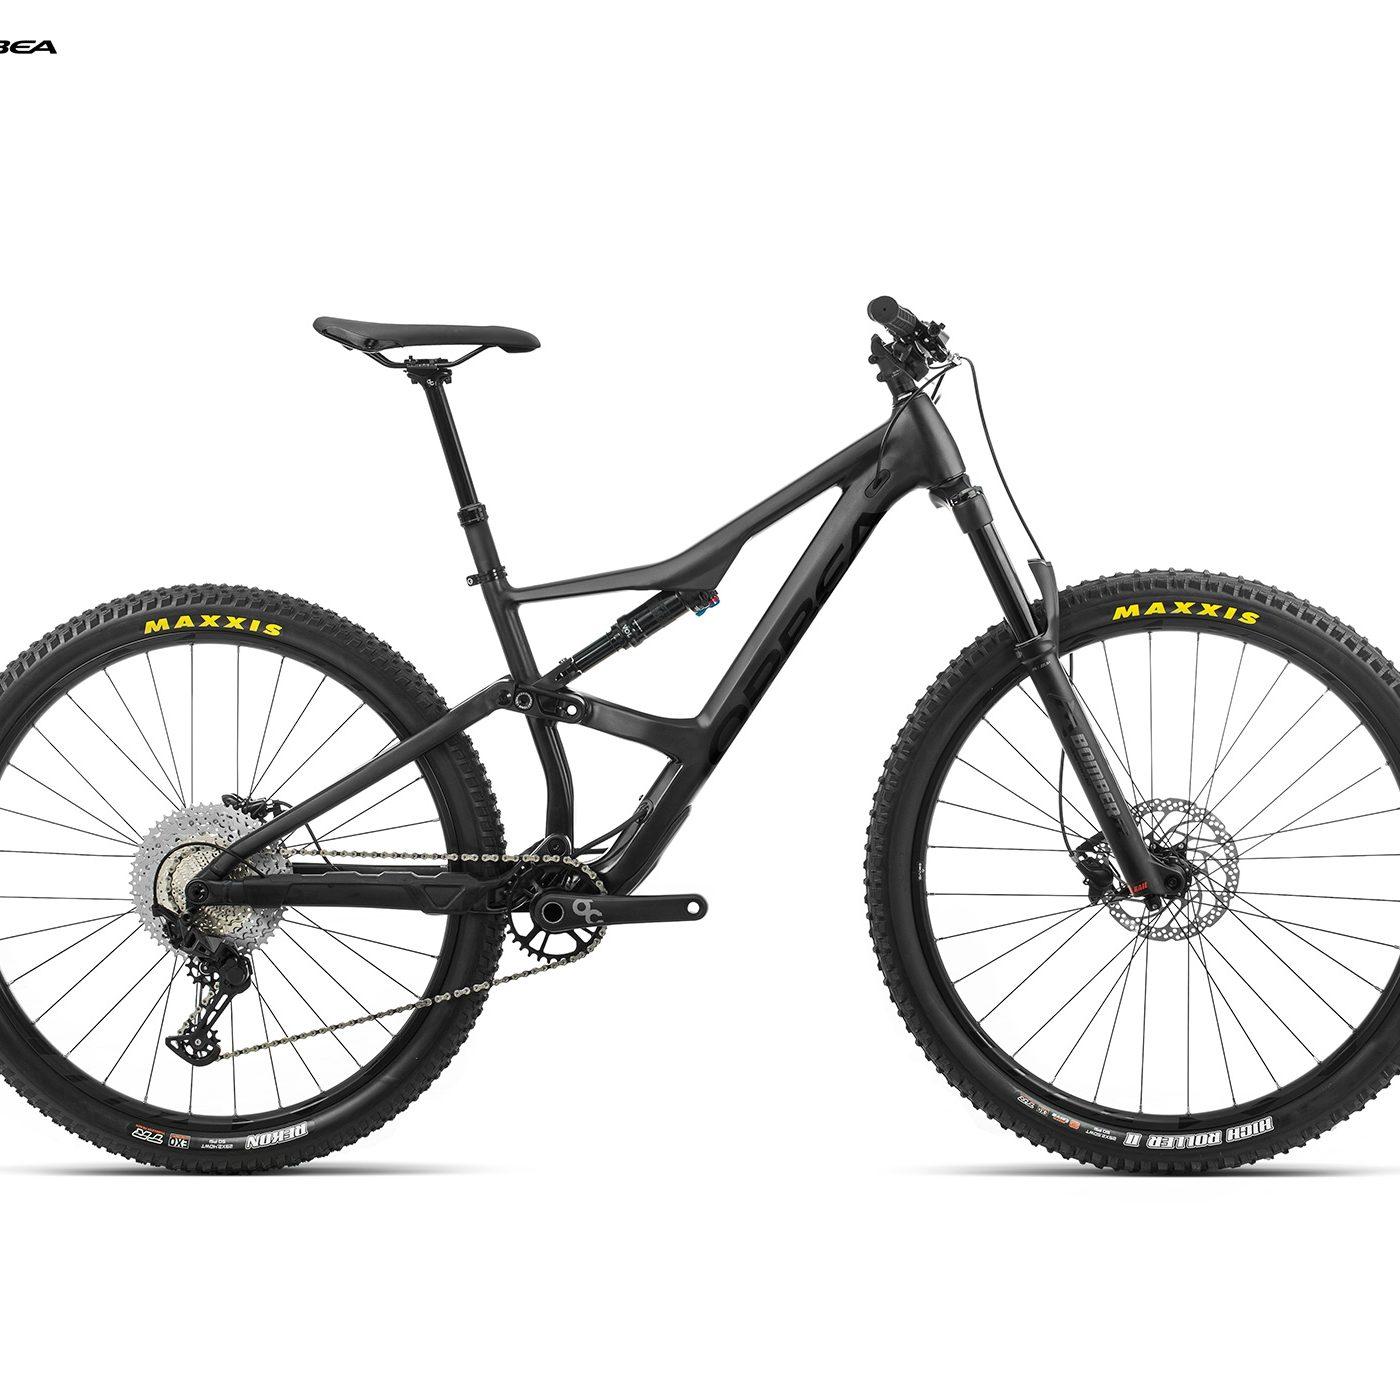 ORBEA Occam H30 - METALLIC ZWART (DOF-GLOSS) @G-Bikes